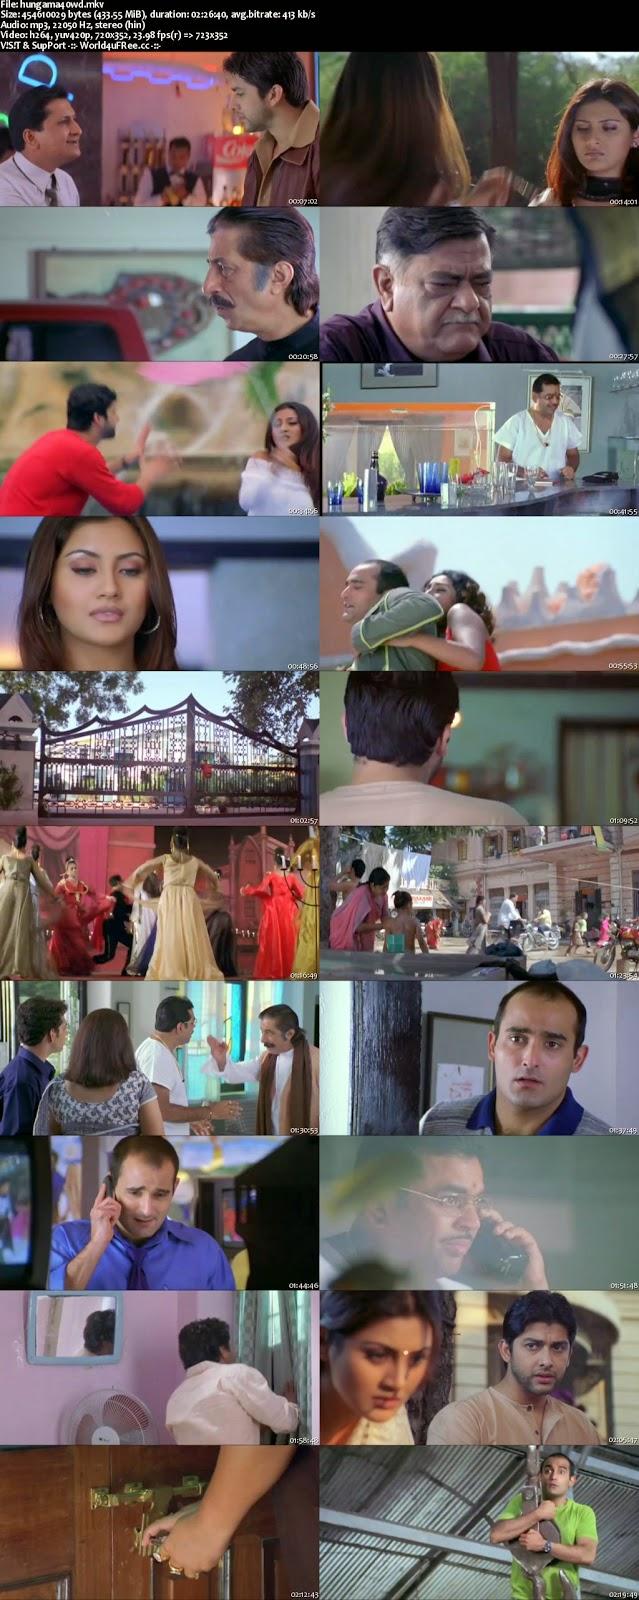 Hungama 2003 Hindi Movie Download. World4ufree.Org